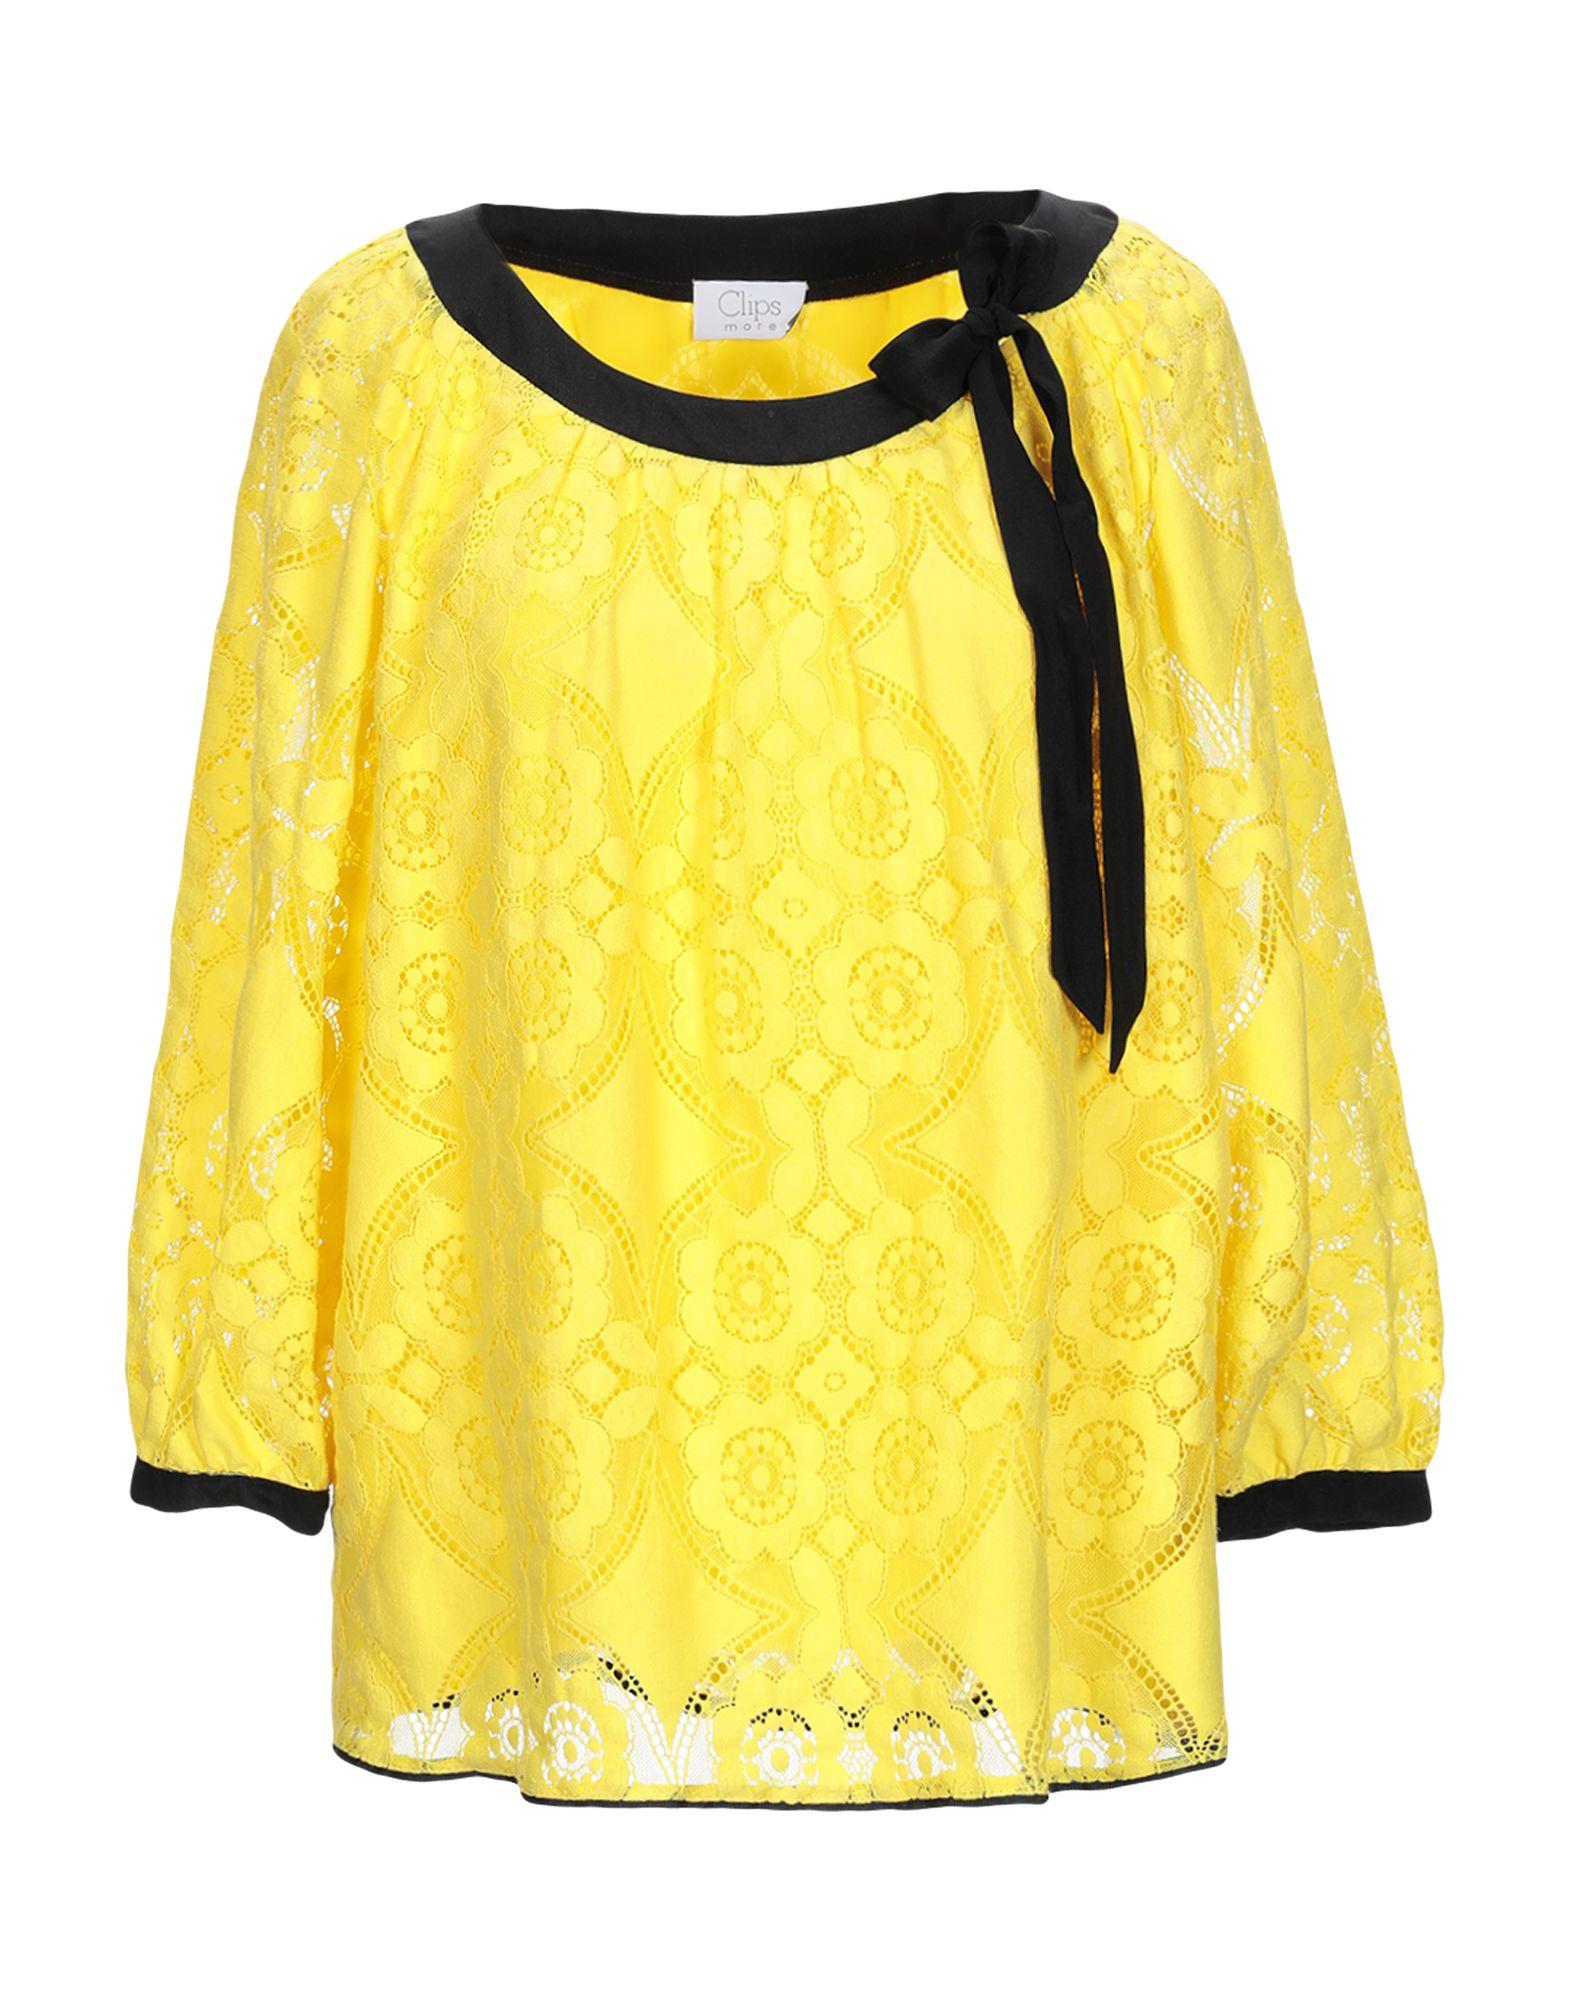 Фото - CLIPS MORE Блузка clips блузка